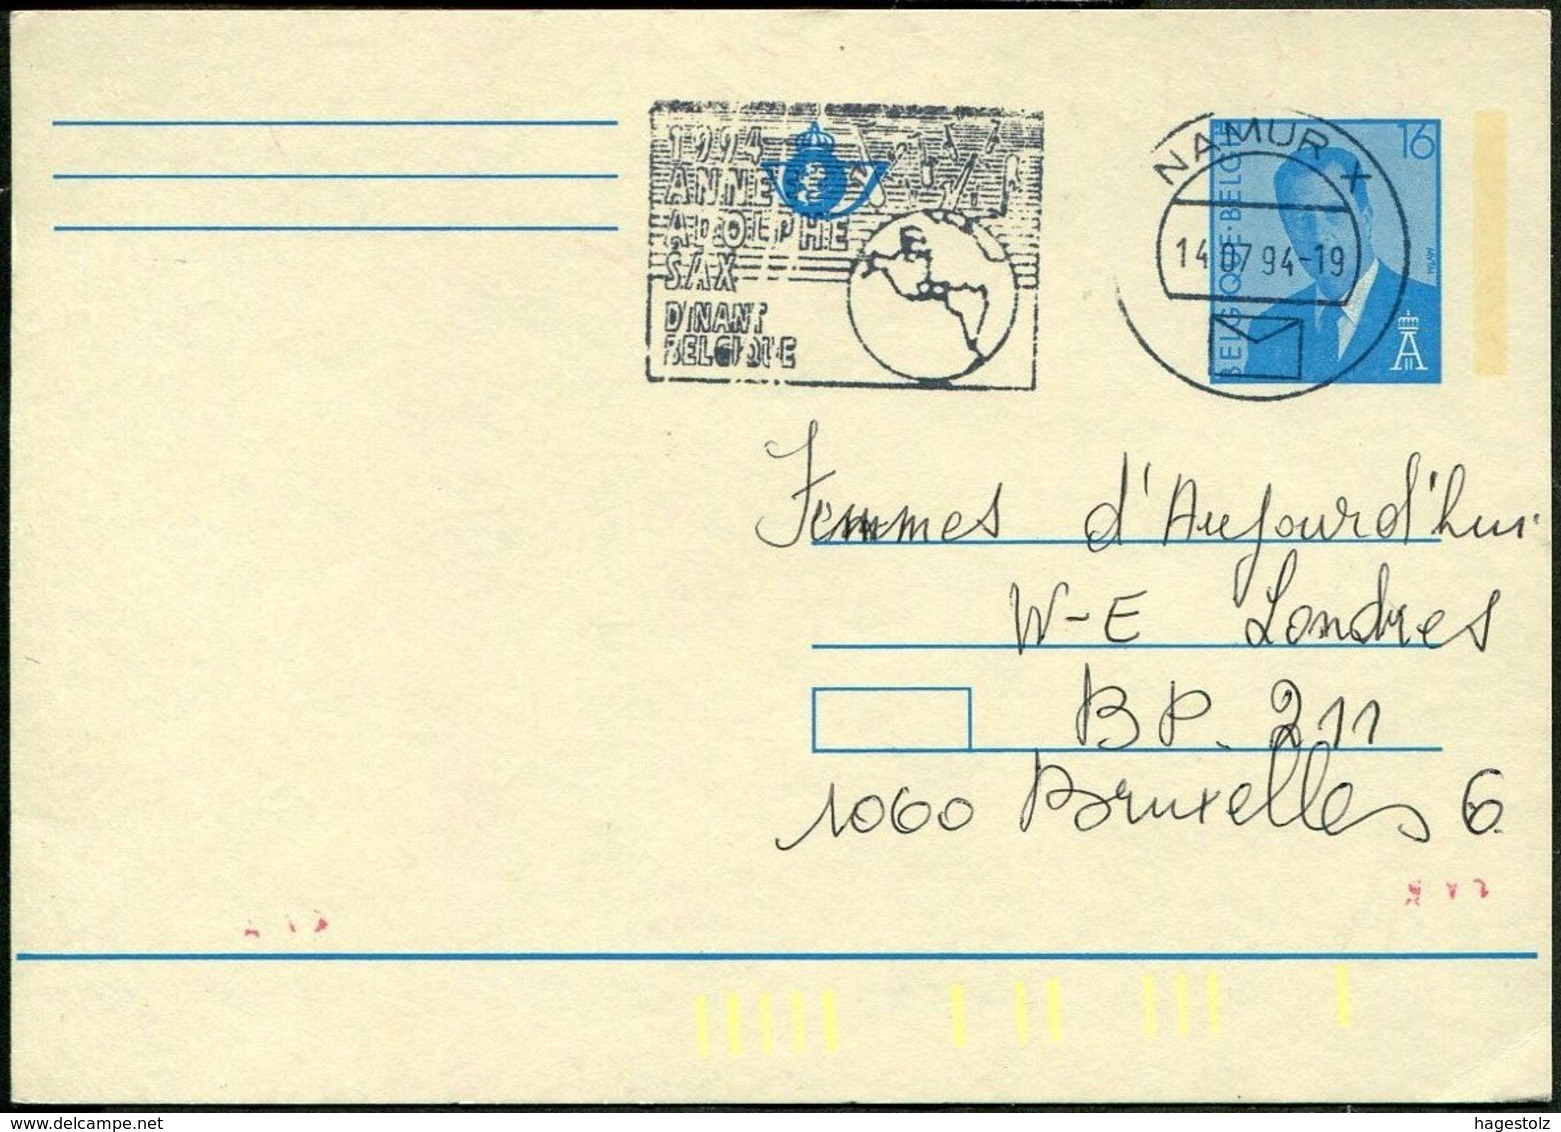 MUSIC Belgium 1994 Namur Card Adolphe Sax Dinant Saxophone Slogan Pmk Werbestempel Flamme Musik Musique België Belgique - Muziek